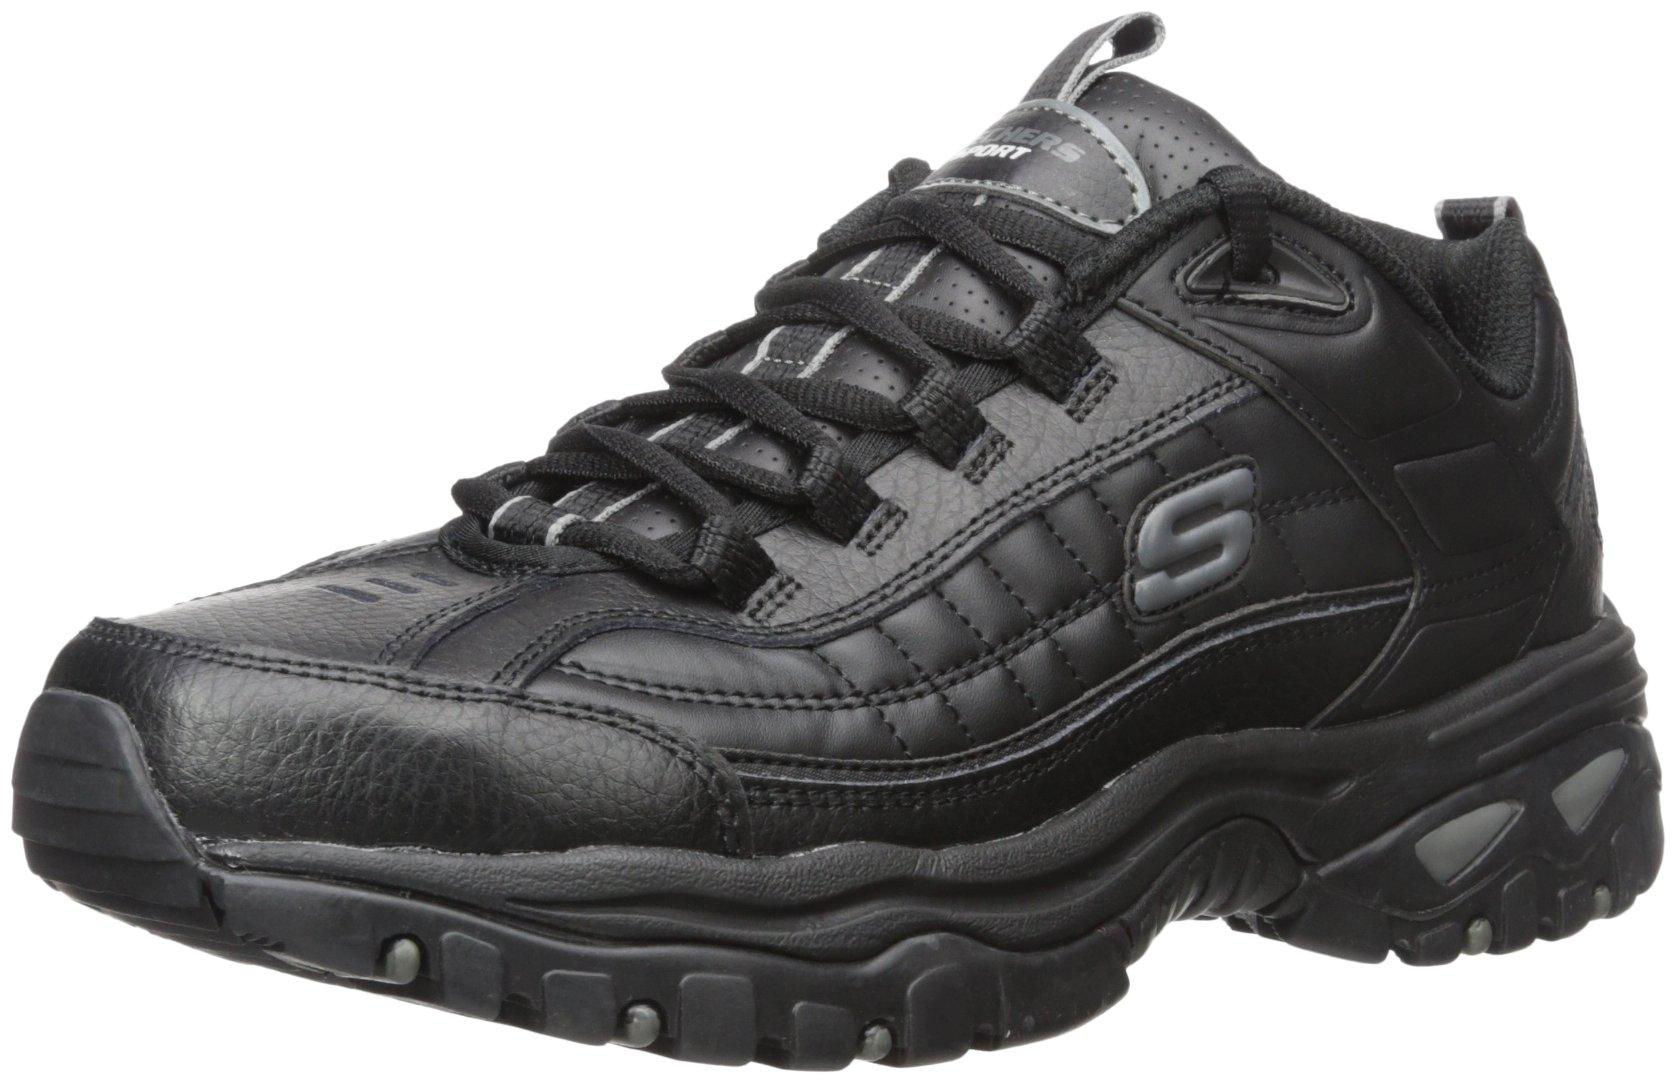 Skechers Sport Men's Energy Afterburn Lace-Up Sneaker,Black,13 M